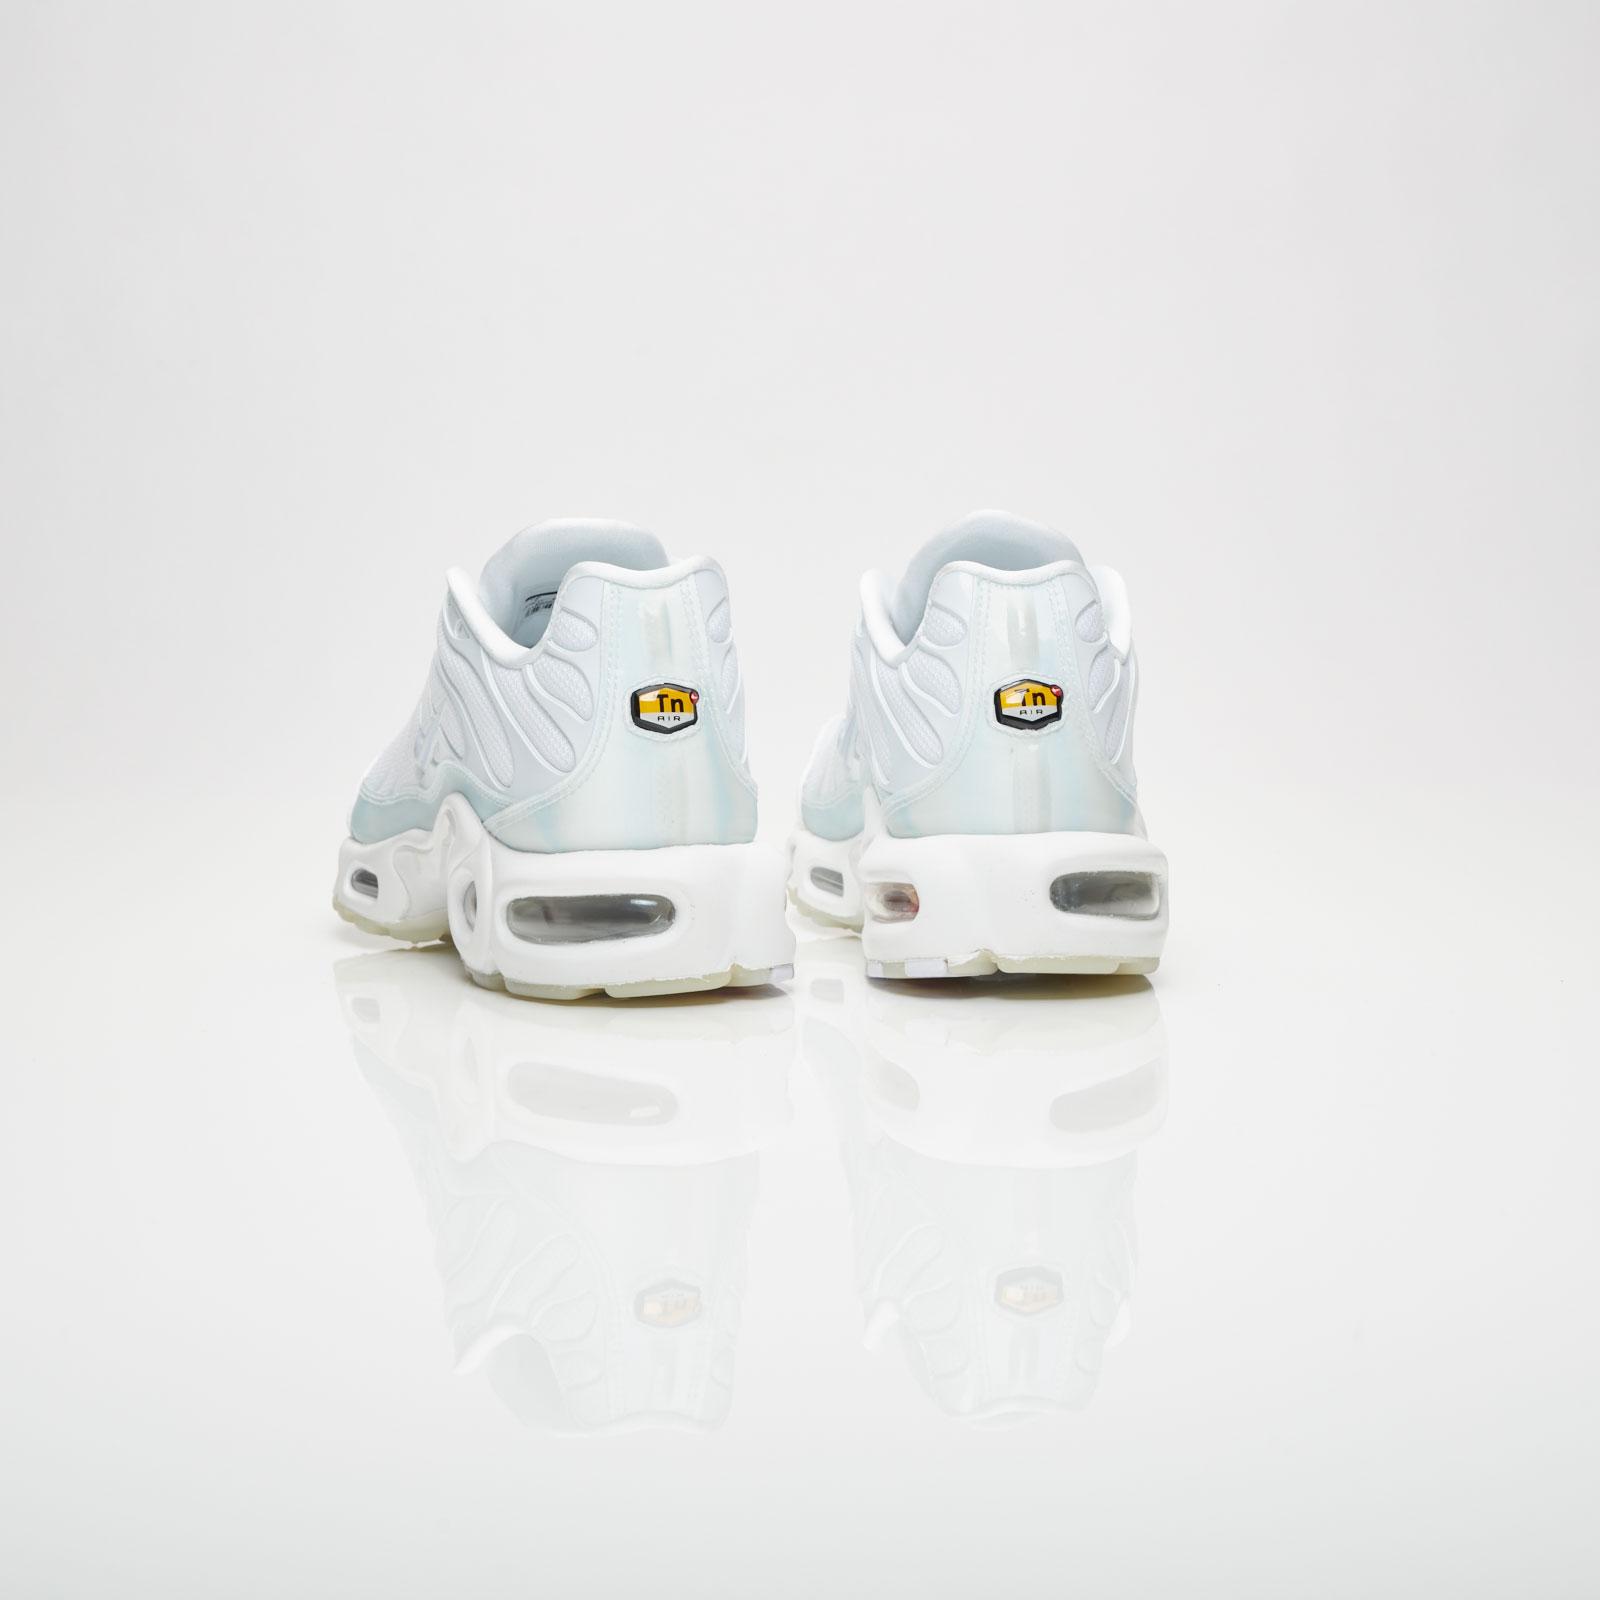 reputable site 60f79 48c31 Nike Wmns Air Max Plus SE - 862201-101 - Sneakersnstuff | sneakers &  streetwear online since 1999